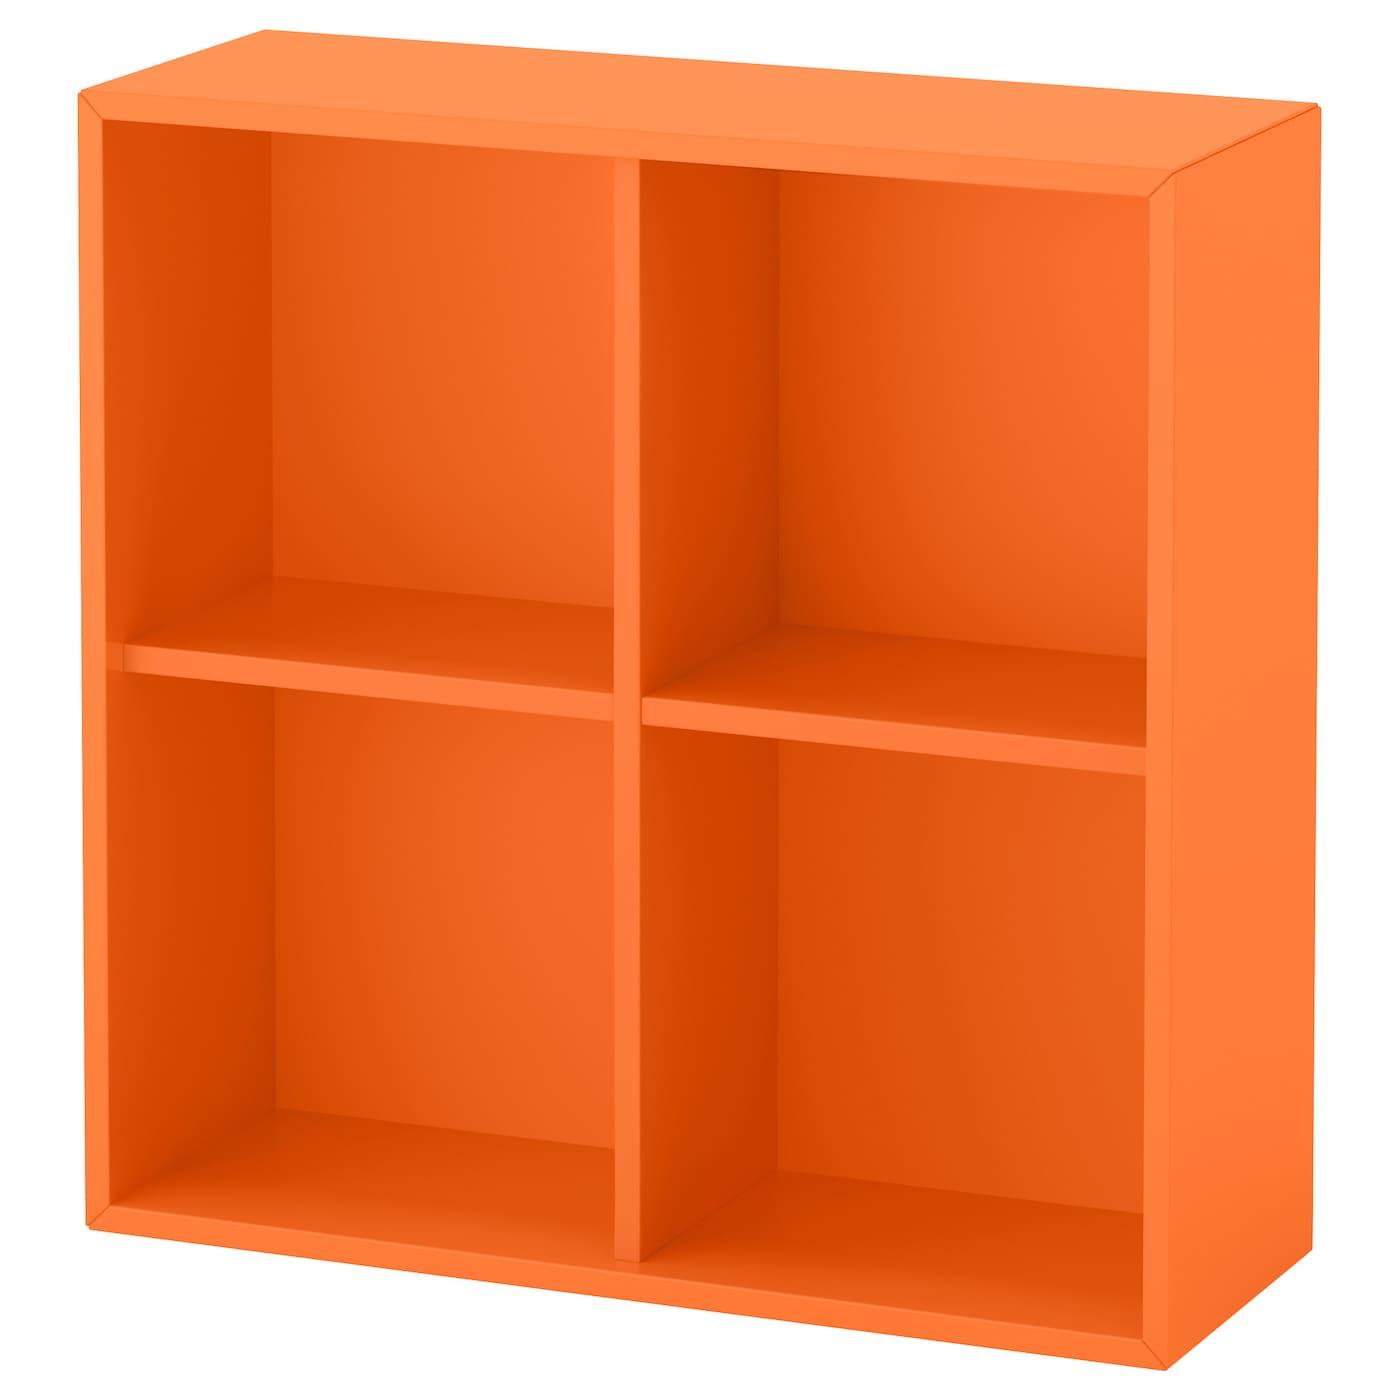 hemnes products catalog orange ikea brown bookcase bookcases us light en